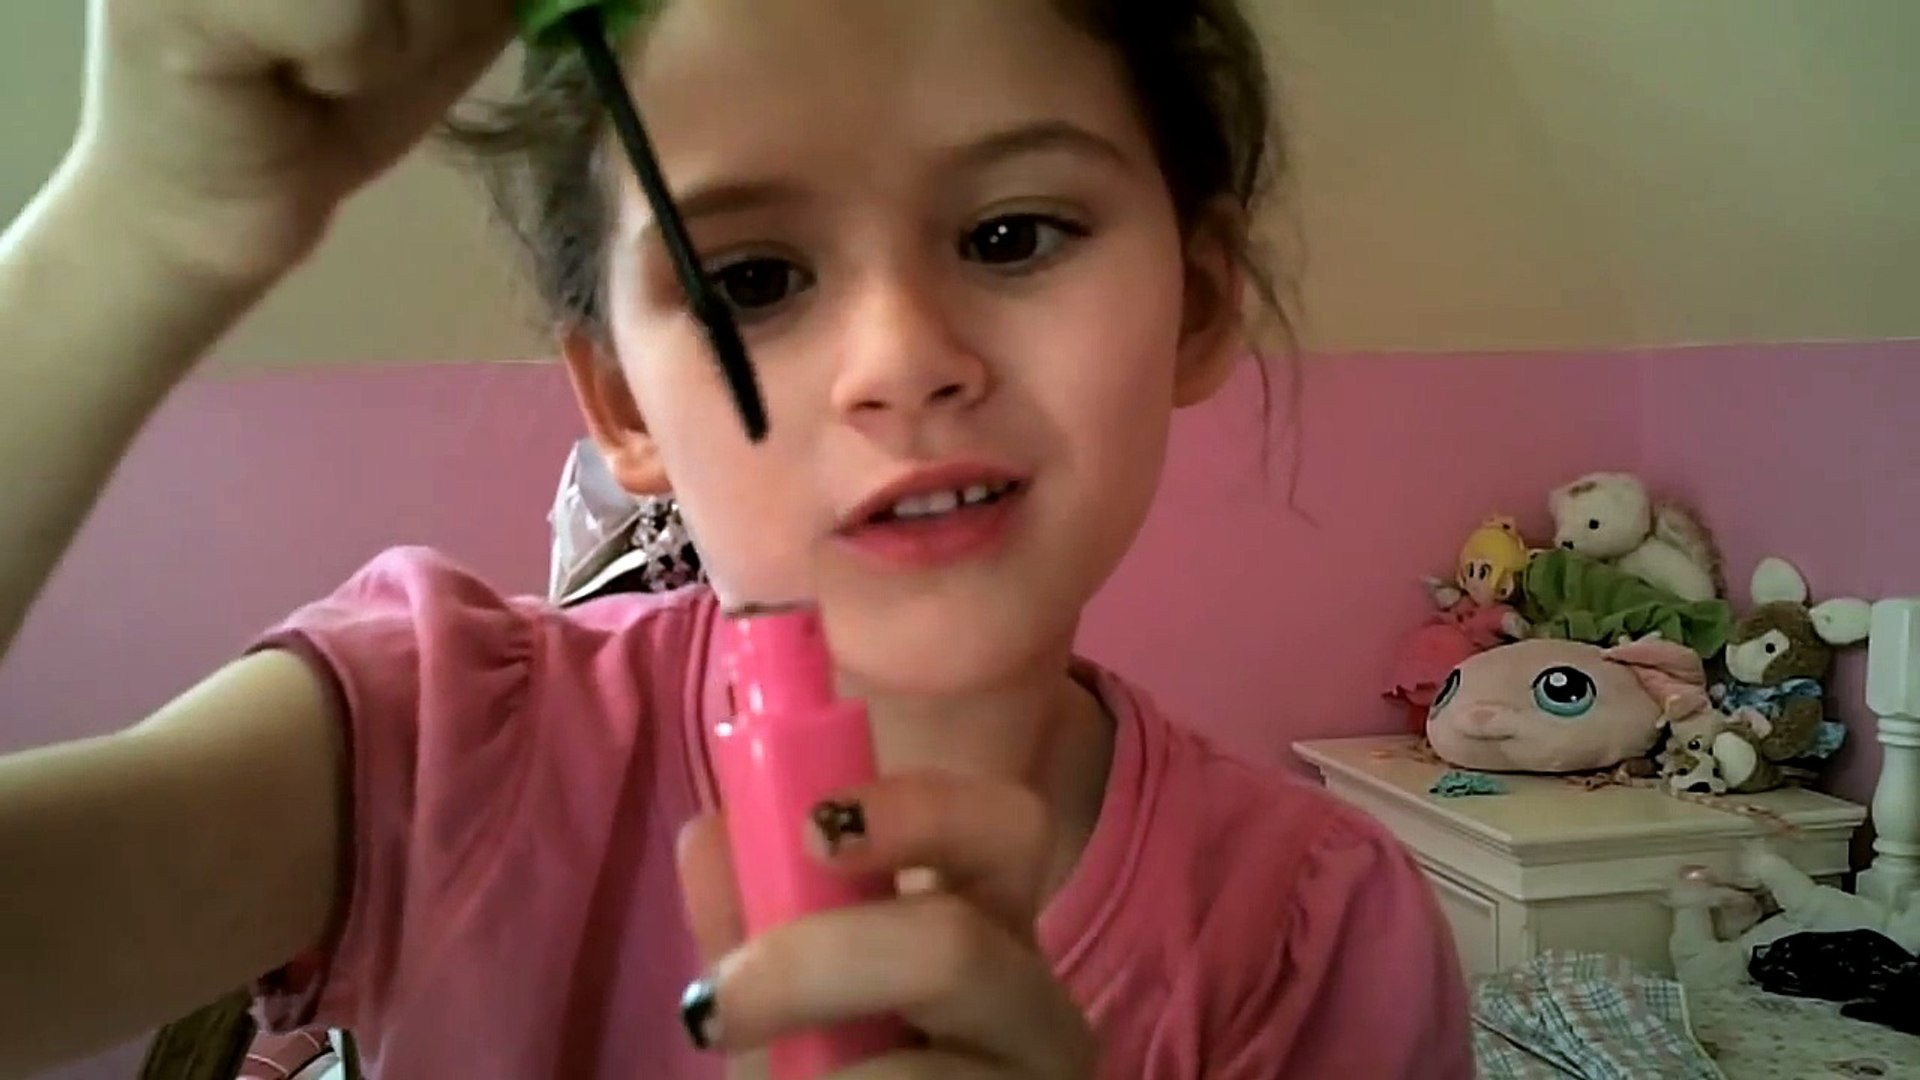 Makeup Tutorials for Kids